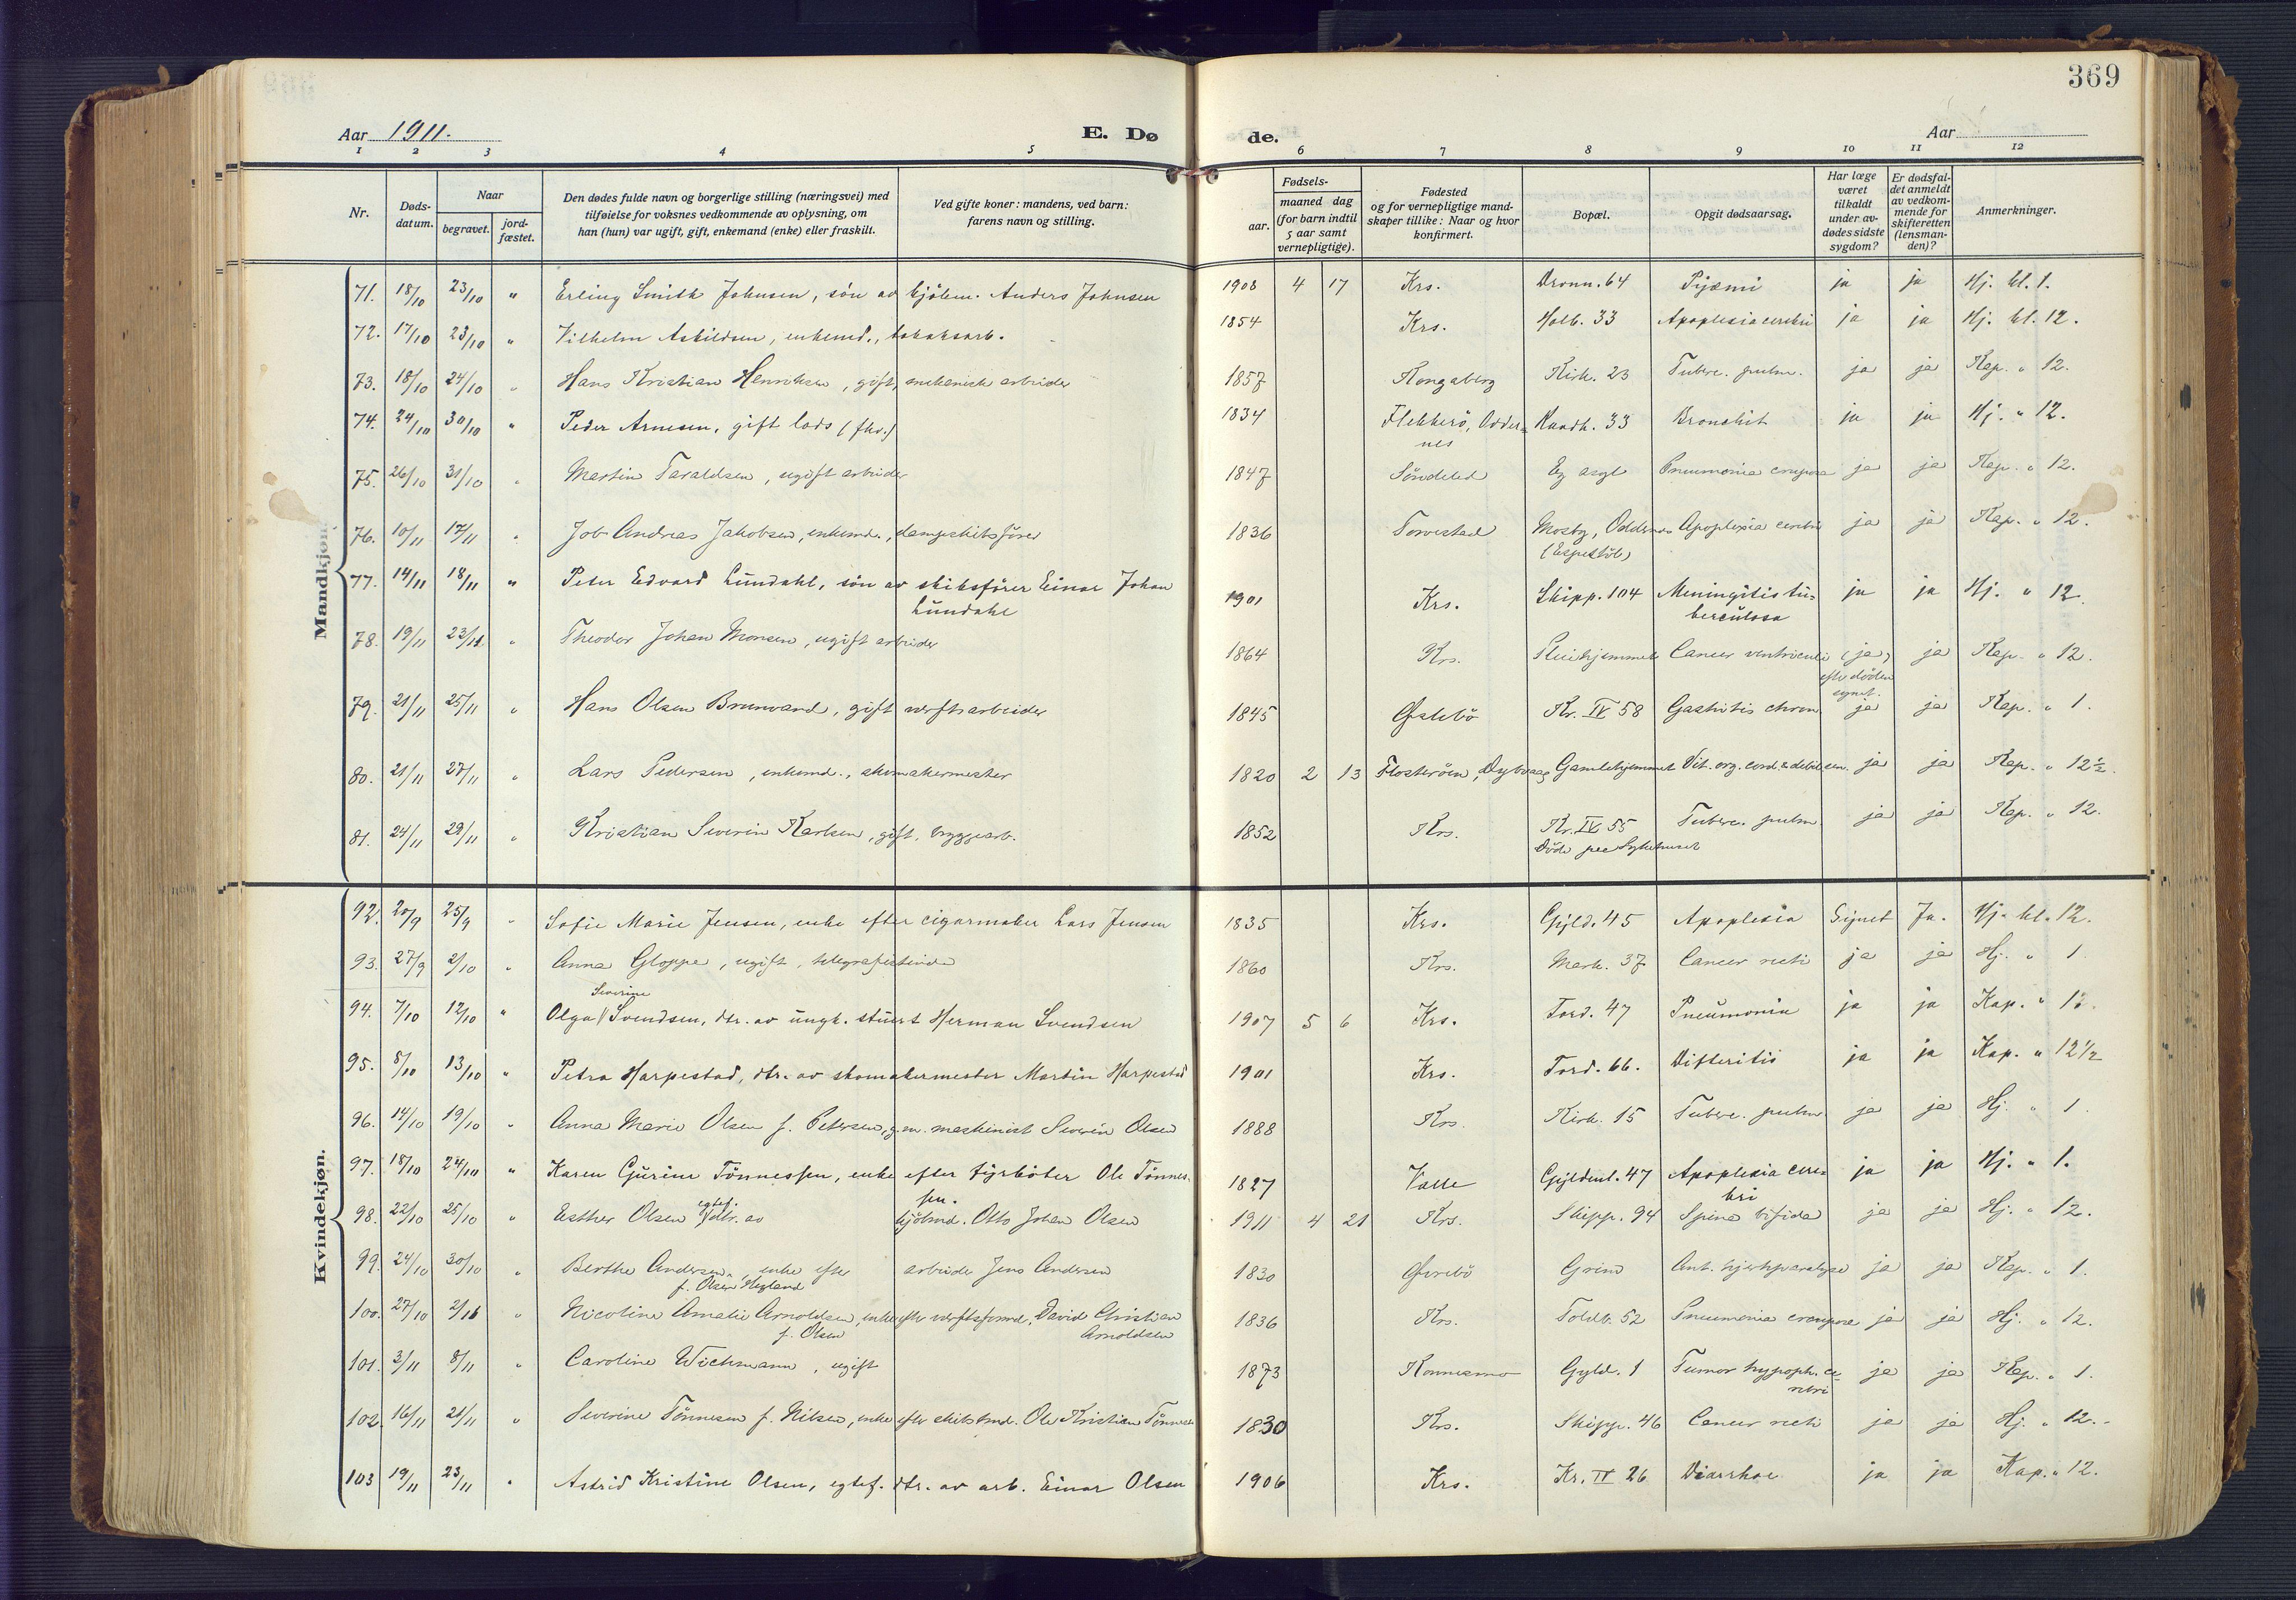 SAK, Kristiansand domprosti, F/Fa/L0023: Ministerialbok nr. A 22, 1909-1917, s. 369